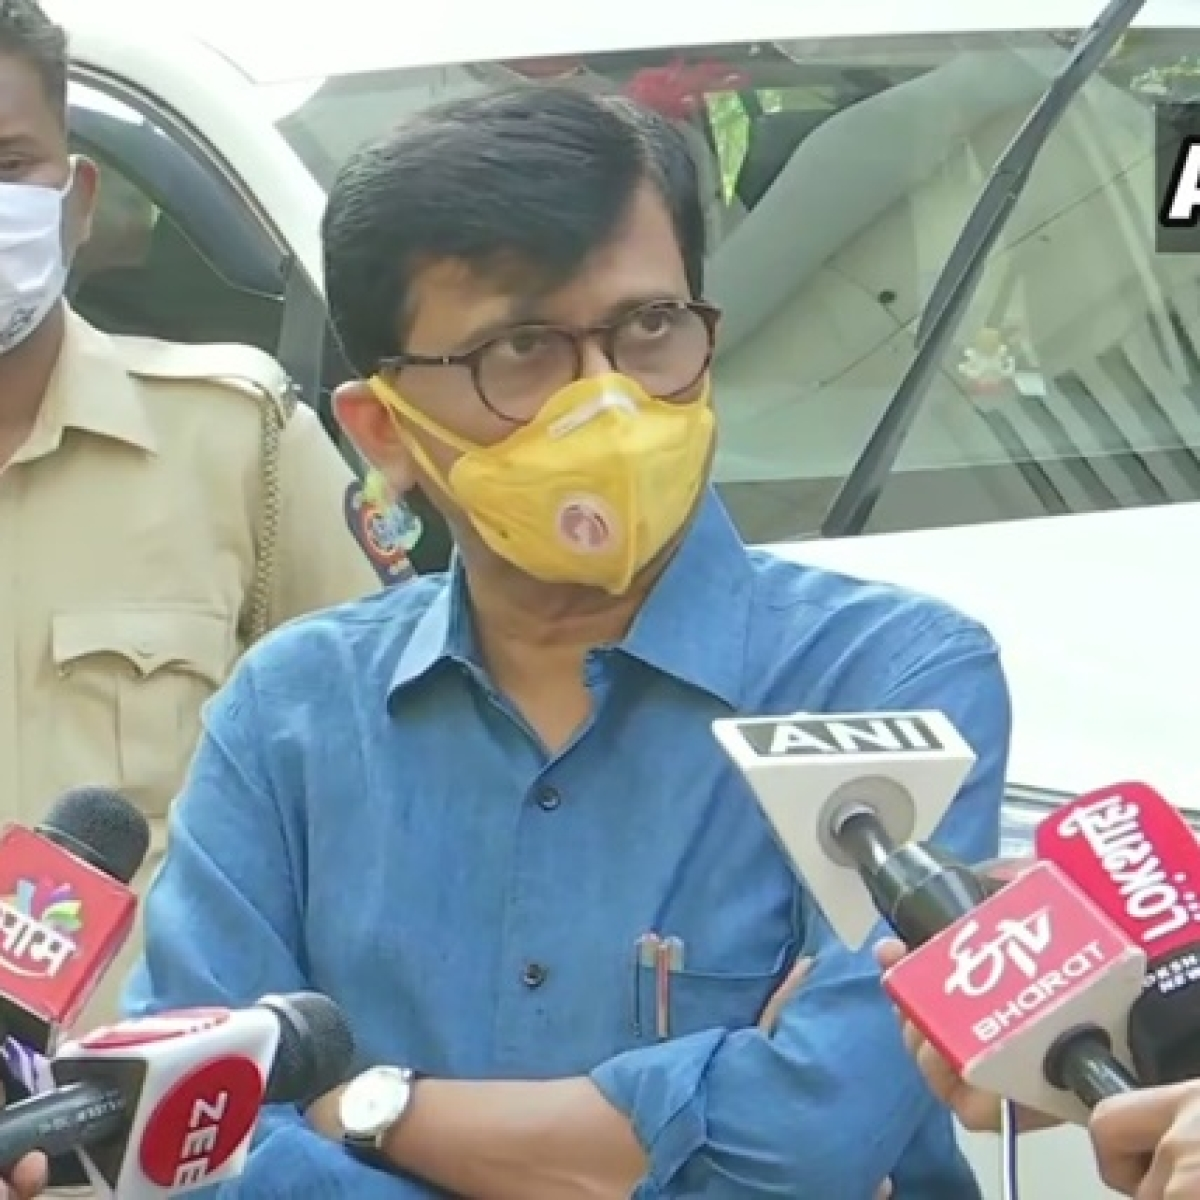 Farmers treated like terrorists, even called Khalistani: Sanjay Raut